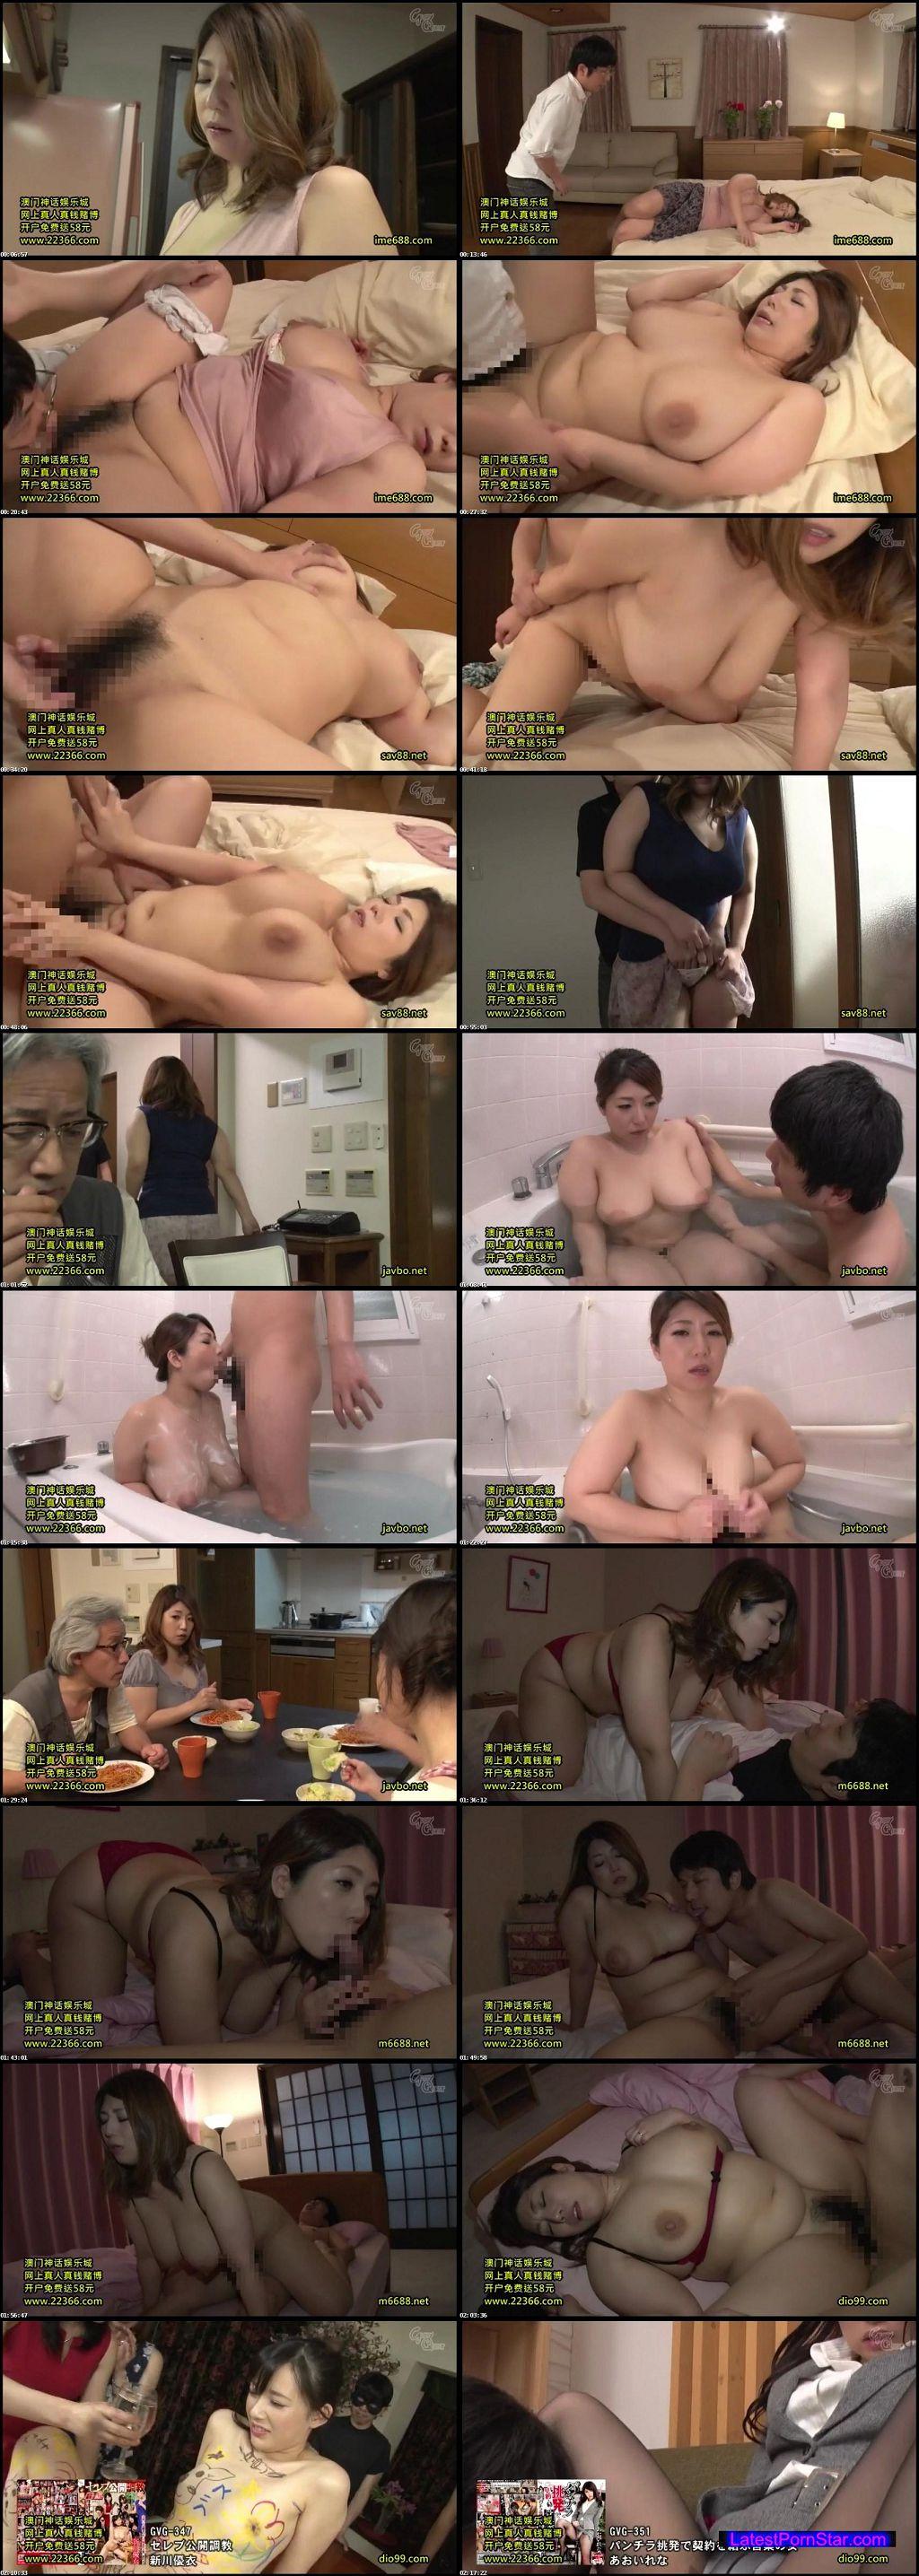 [GVG-354] 姑の卑猥過ぎる巨乳を狙う娘婿 葉月奈穂